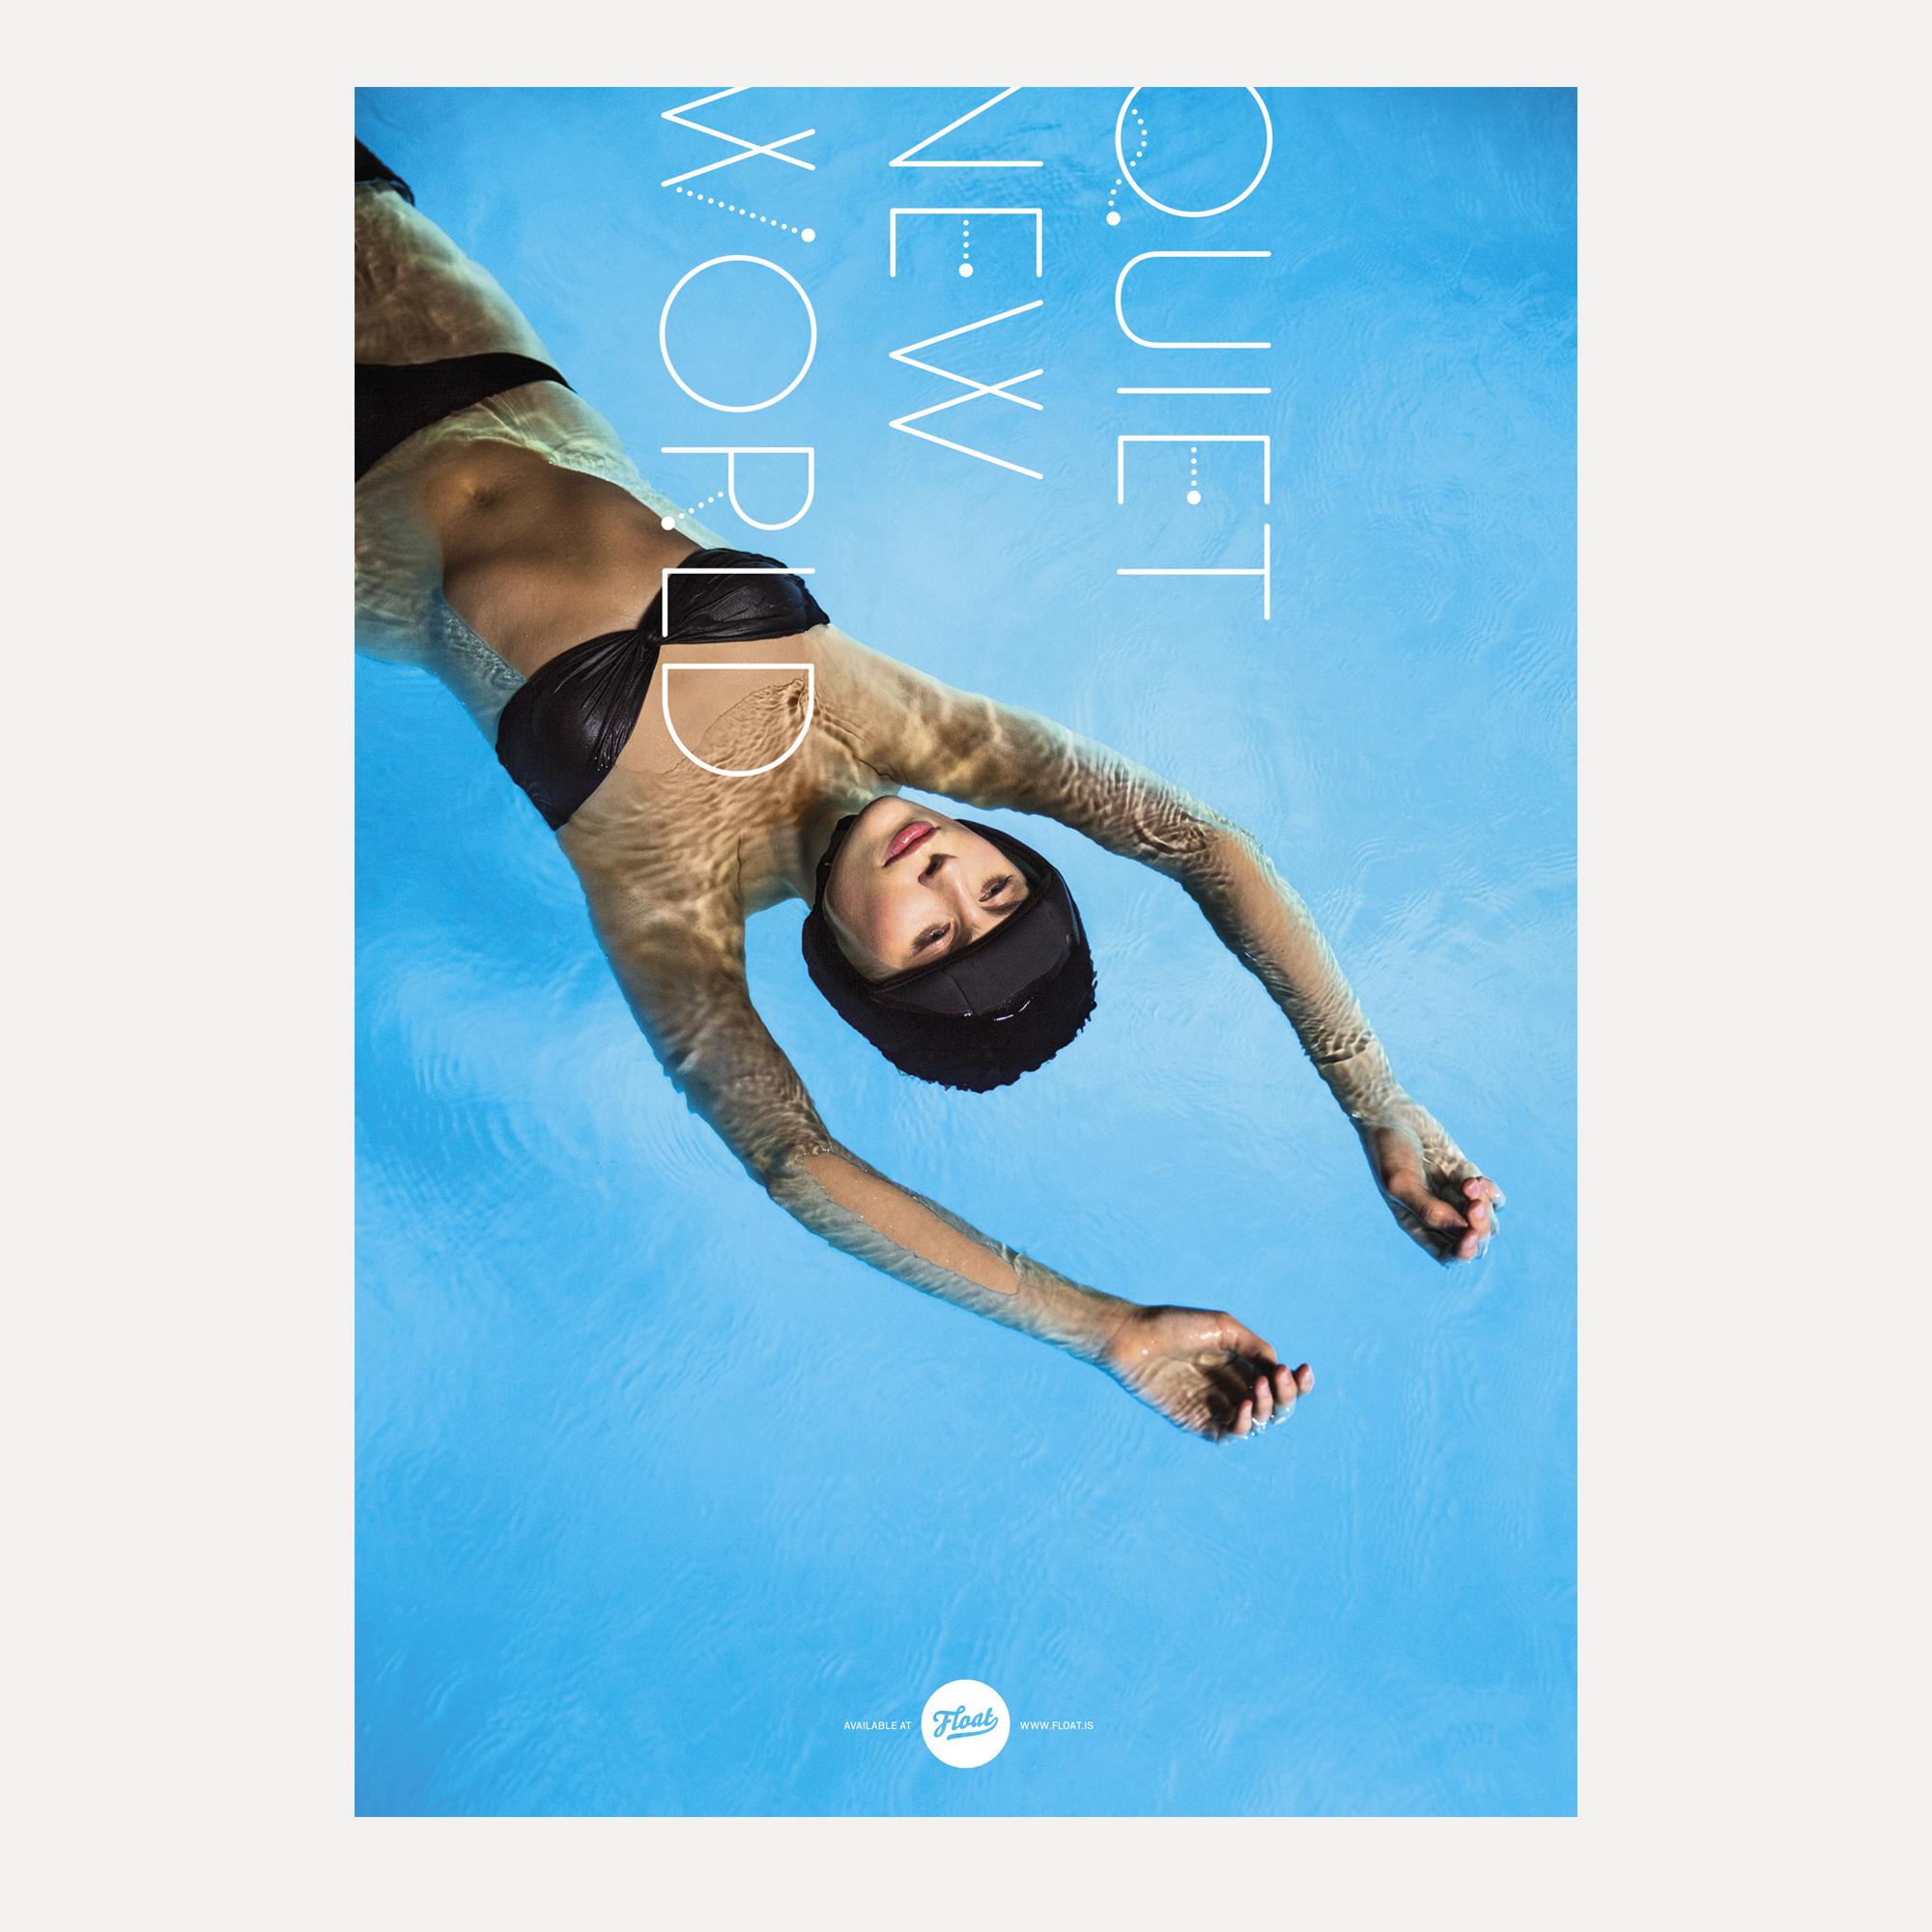 Quiet New World, Flothetta. 2015.